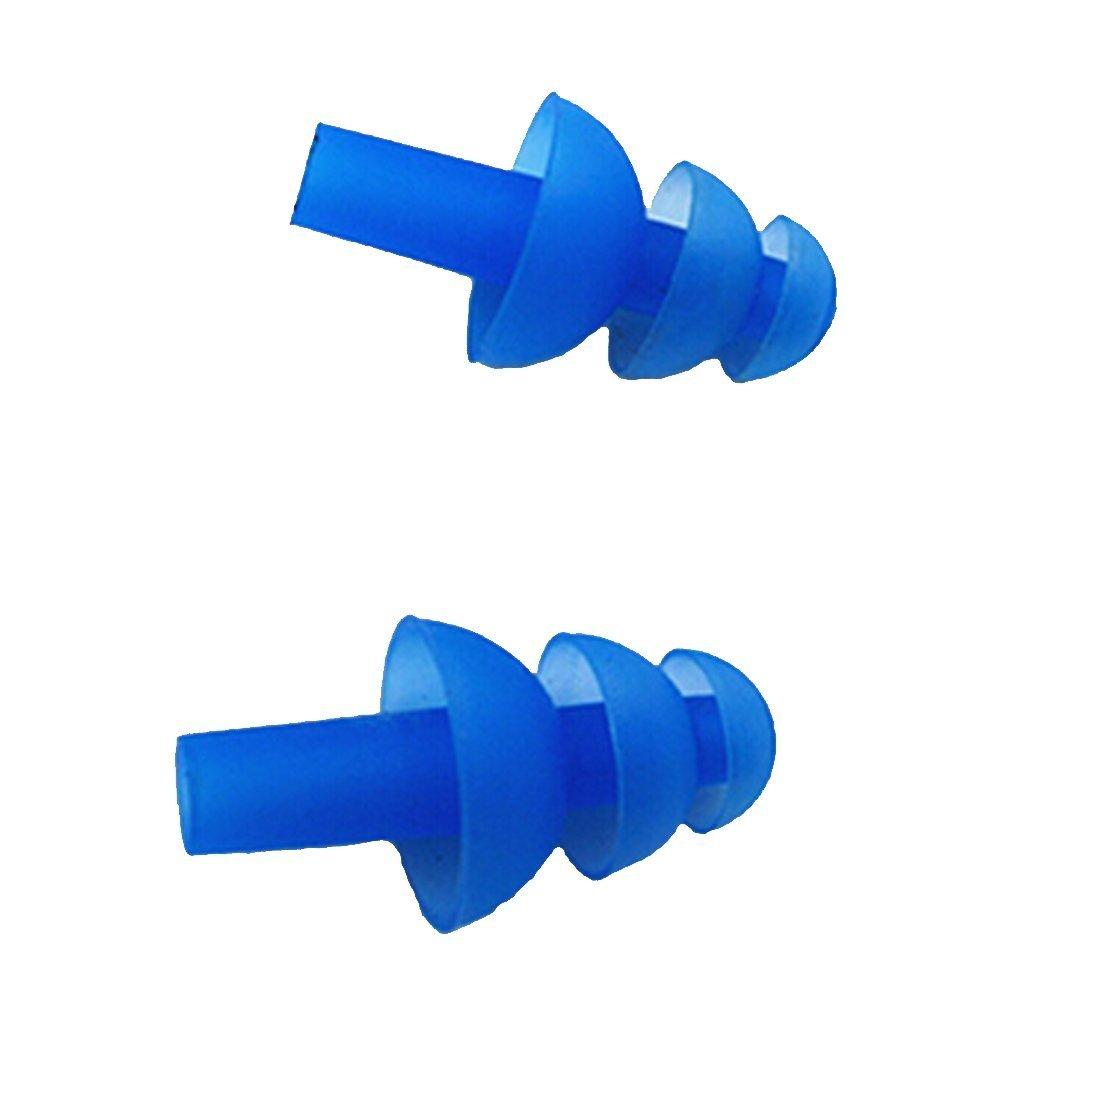 esowemsn Blue 6PAIRS Soft Silicone Earplus Swimmers Flexible Ear Plugs for Swimming Sleeping with Earplug Case